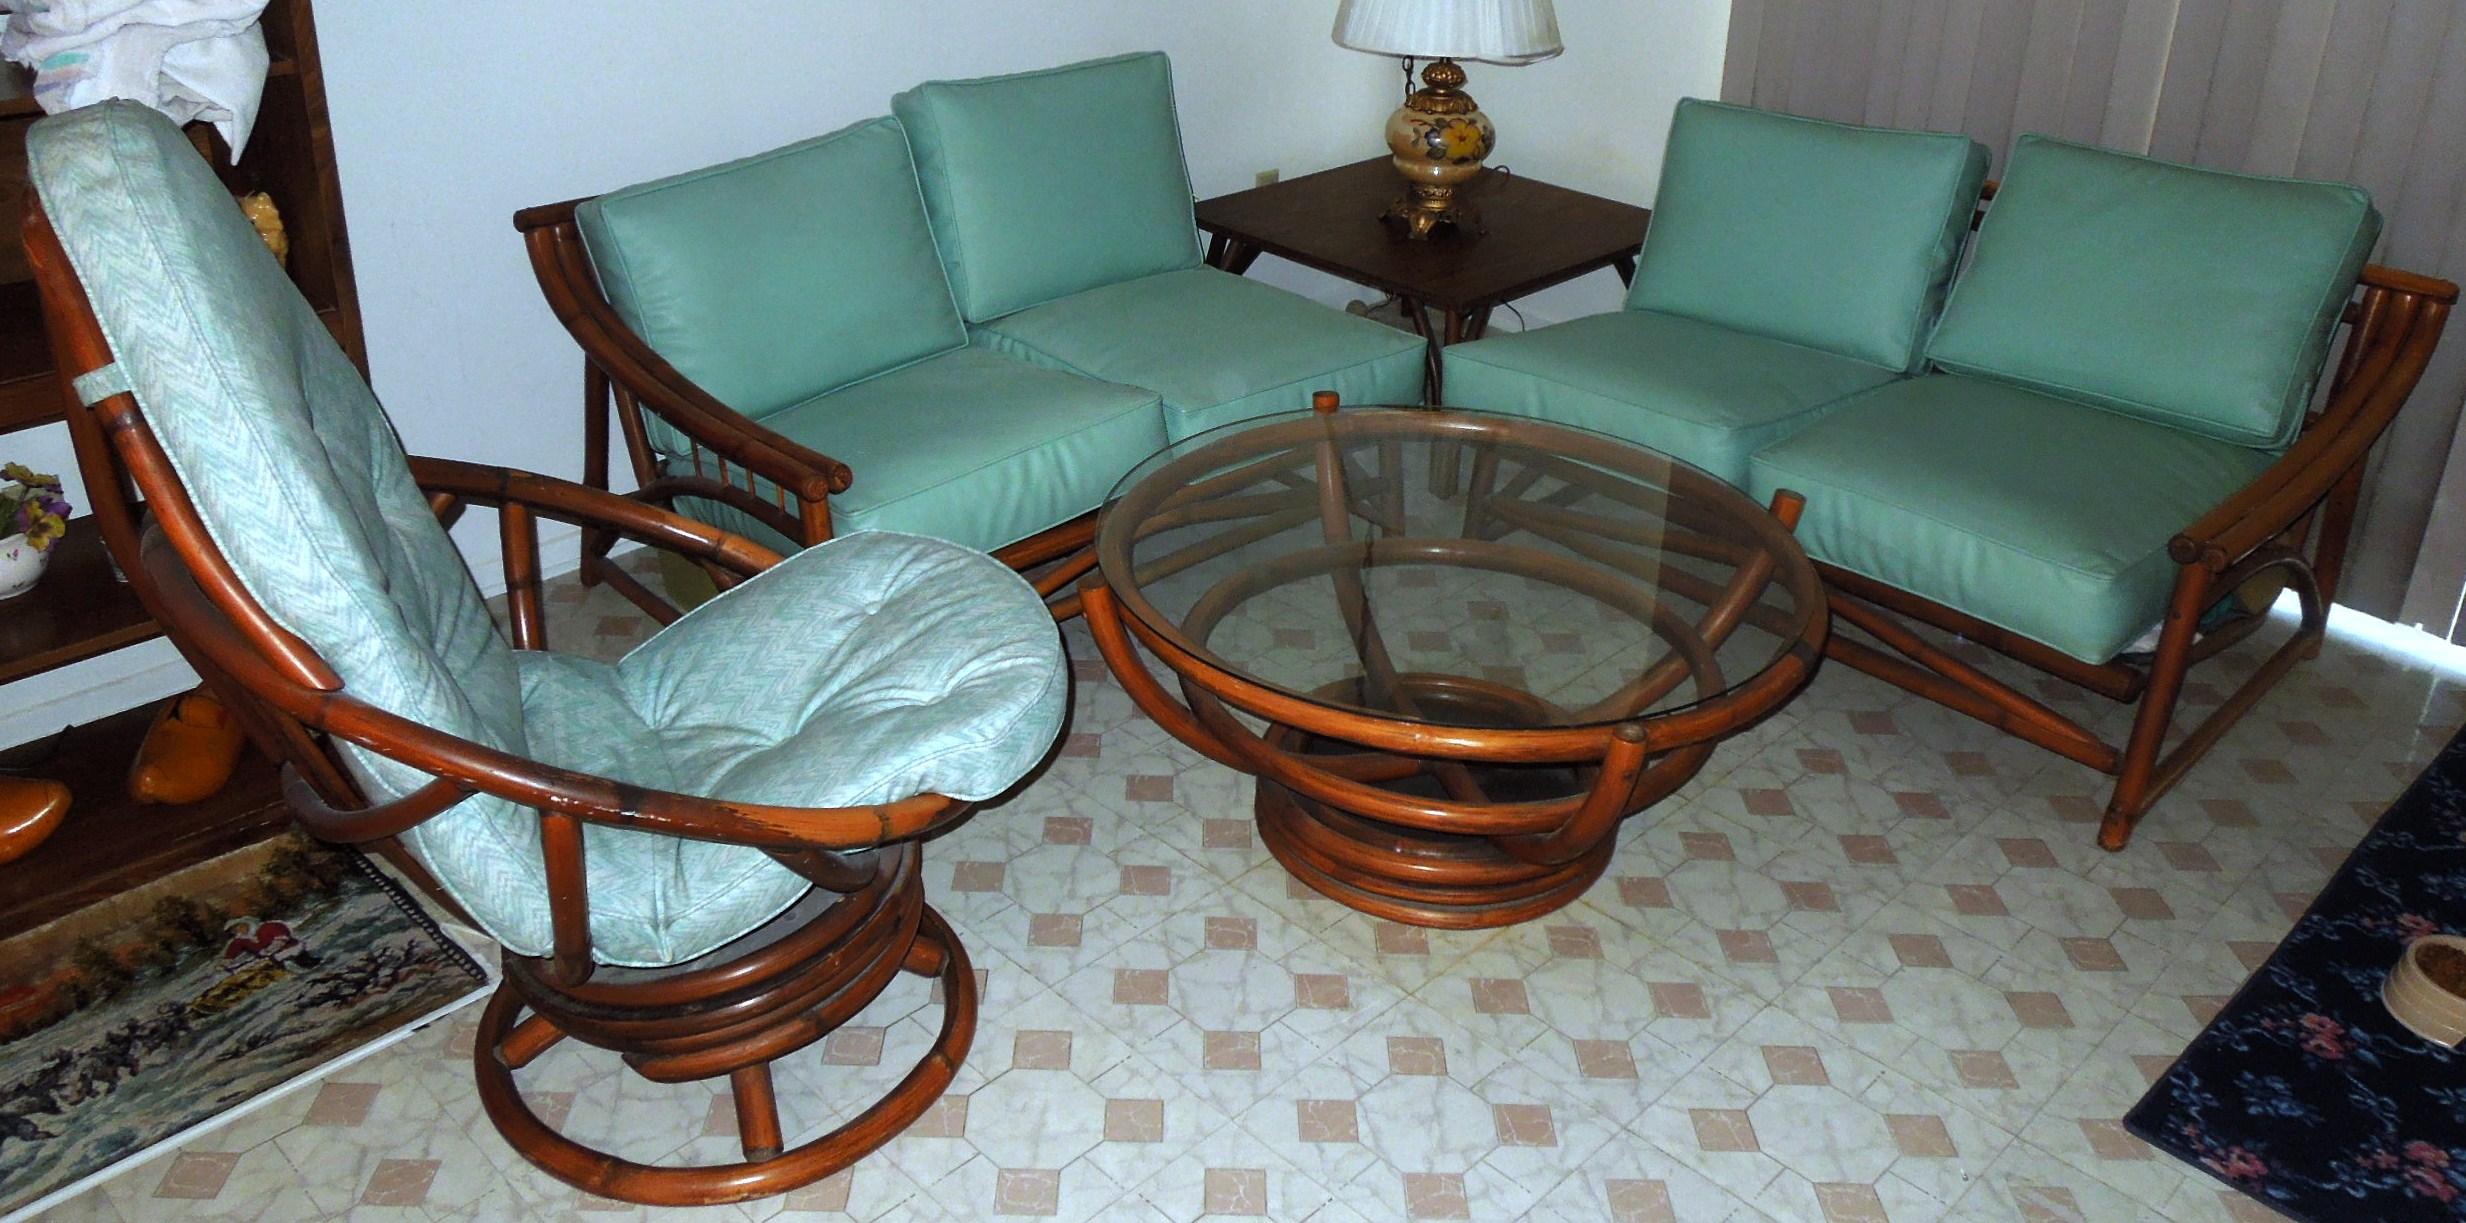 1960s Vintage Bamboo Vinyl Retro Living Room Furniture Set